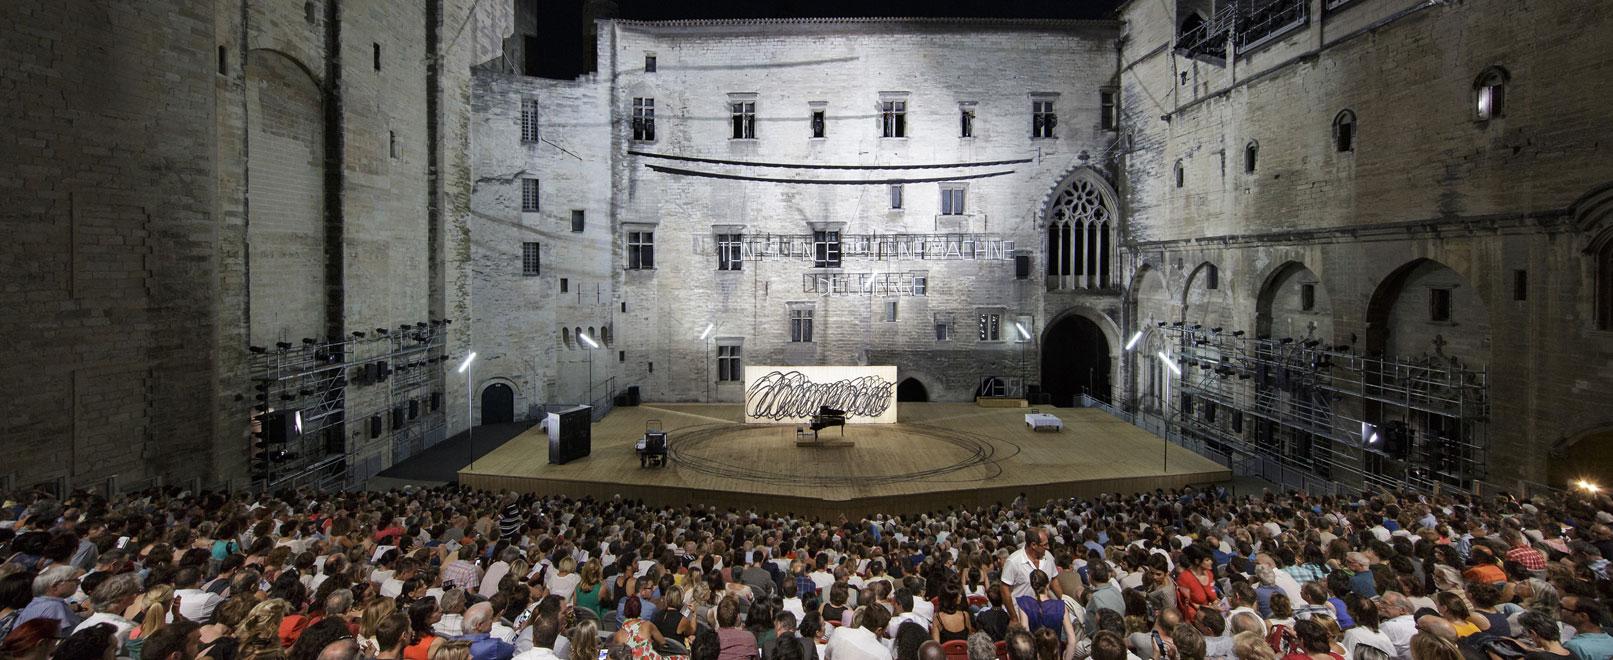 Avignon Festival – Pope's Palace © Raynaud-de-Lage